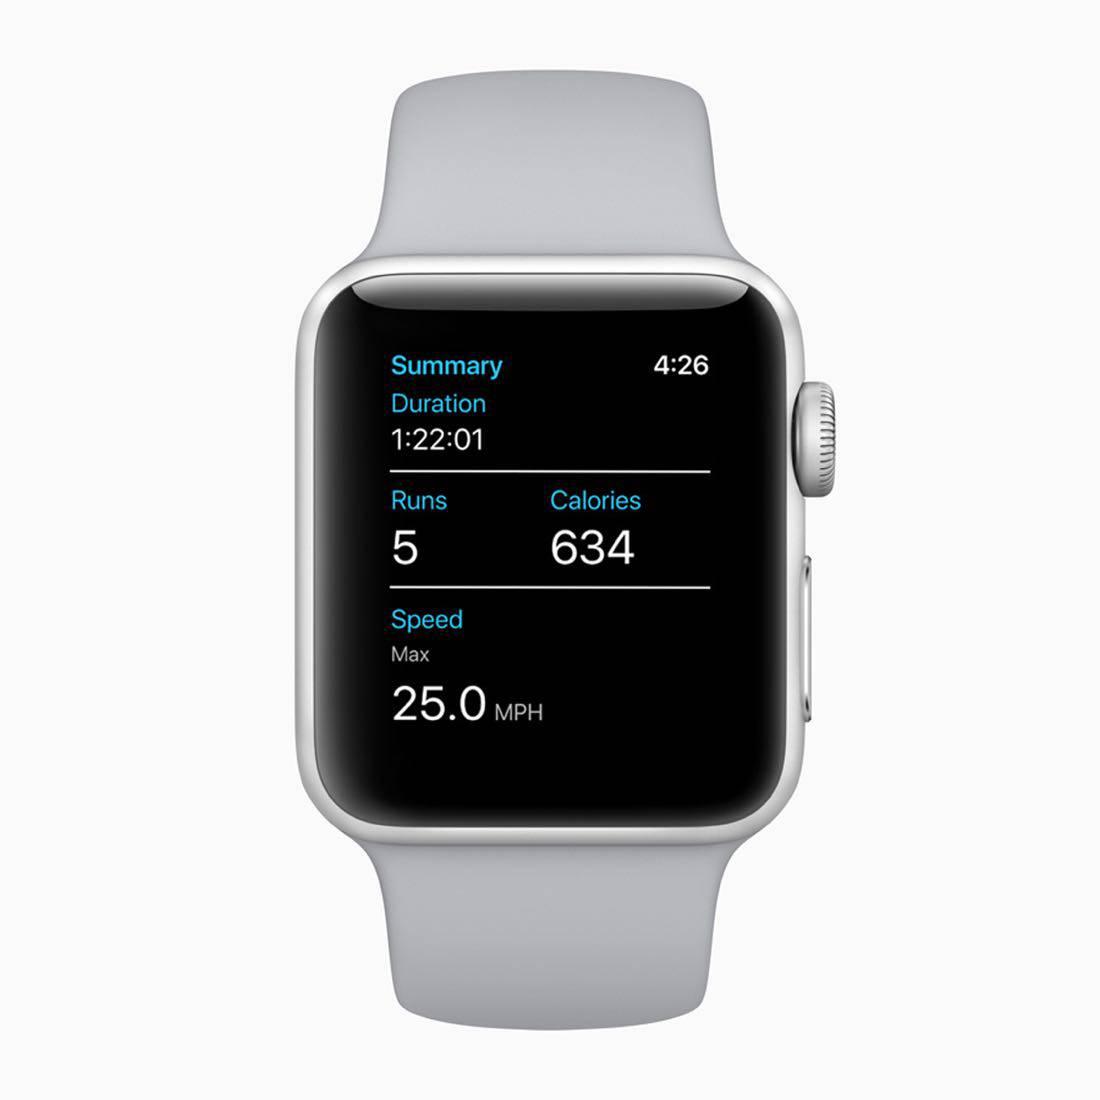 Apple Watch Series 3 summary 20282018